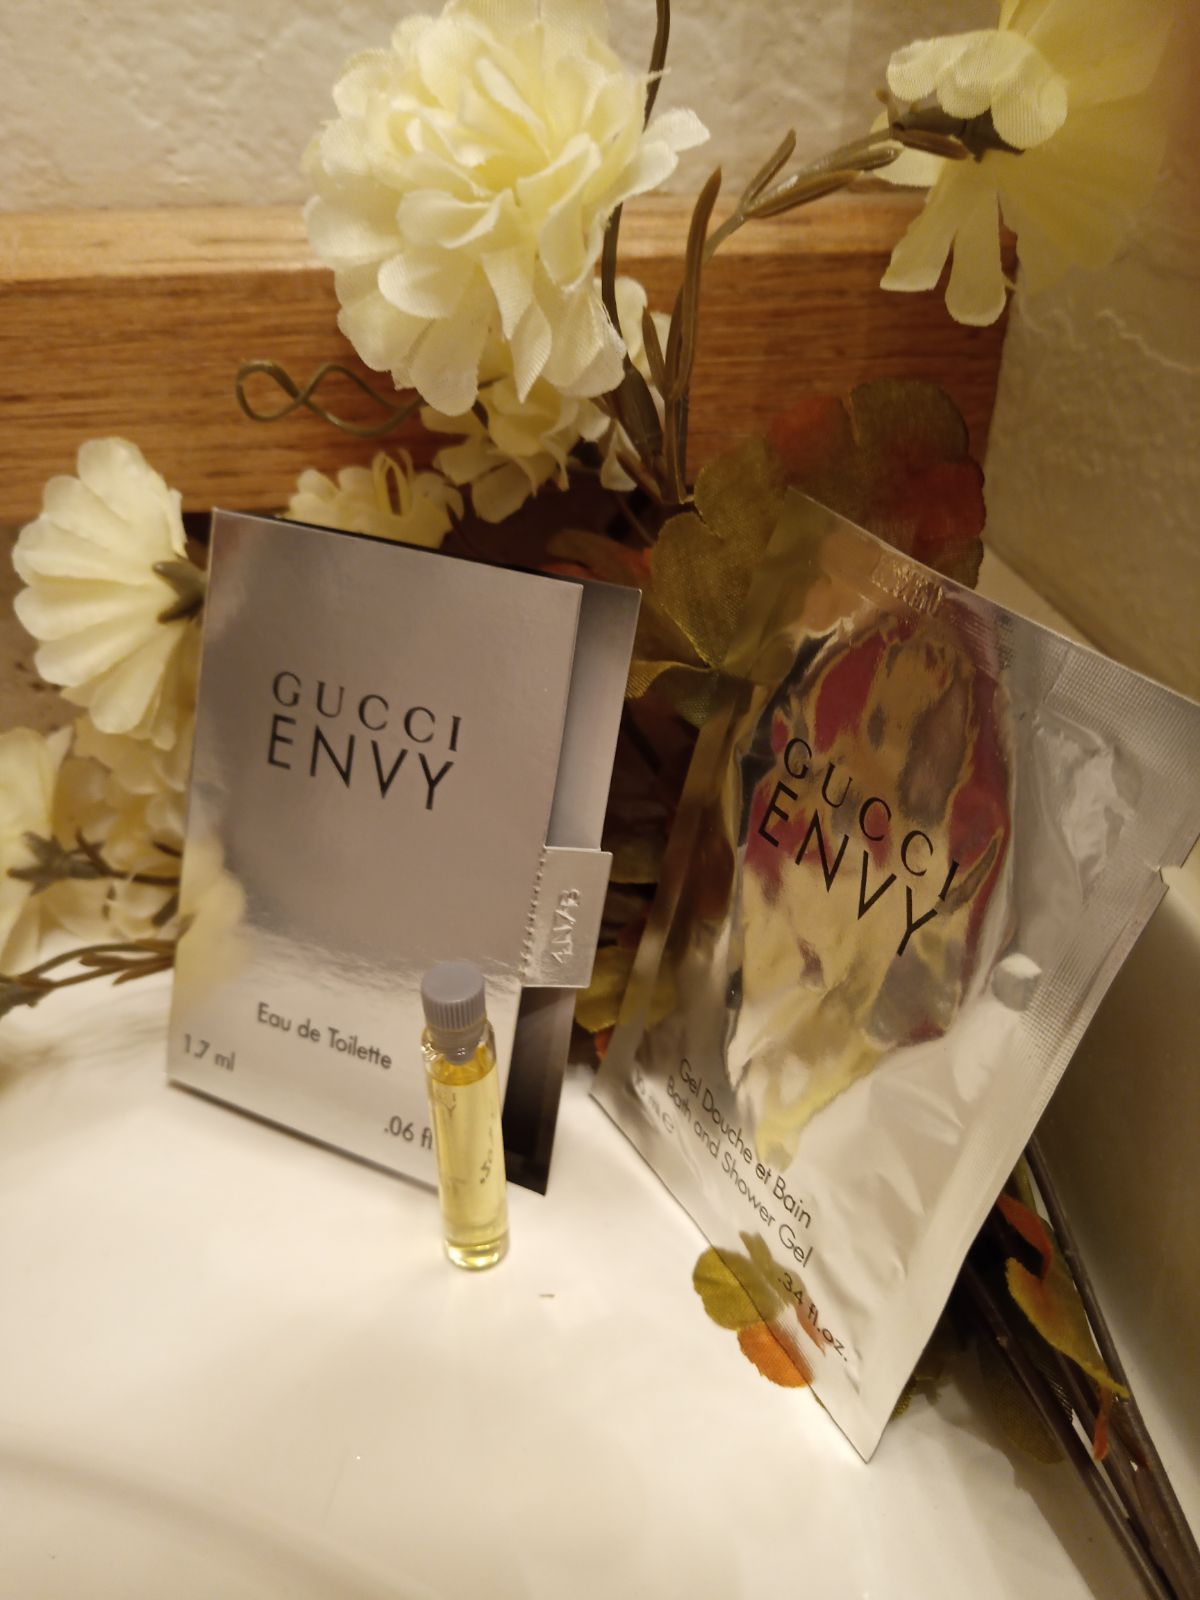 Gucci ENVY PERFUME EDT - 2 SETS-SEE DESC